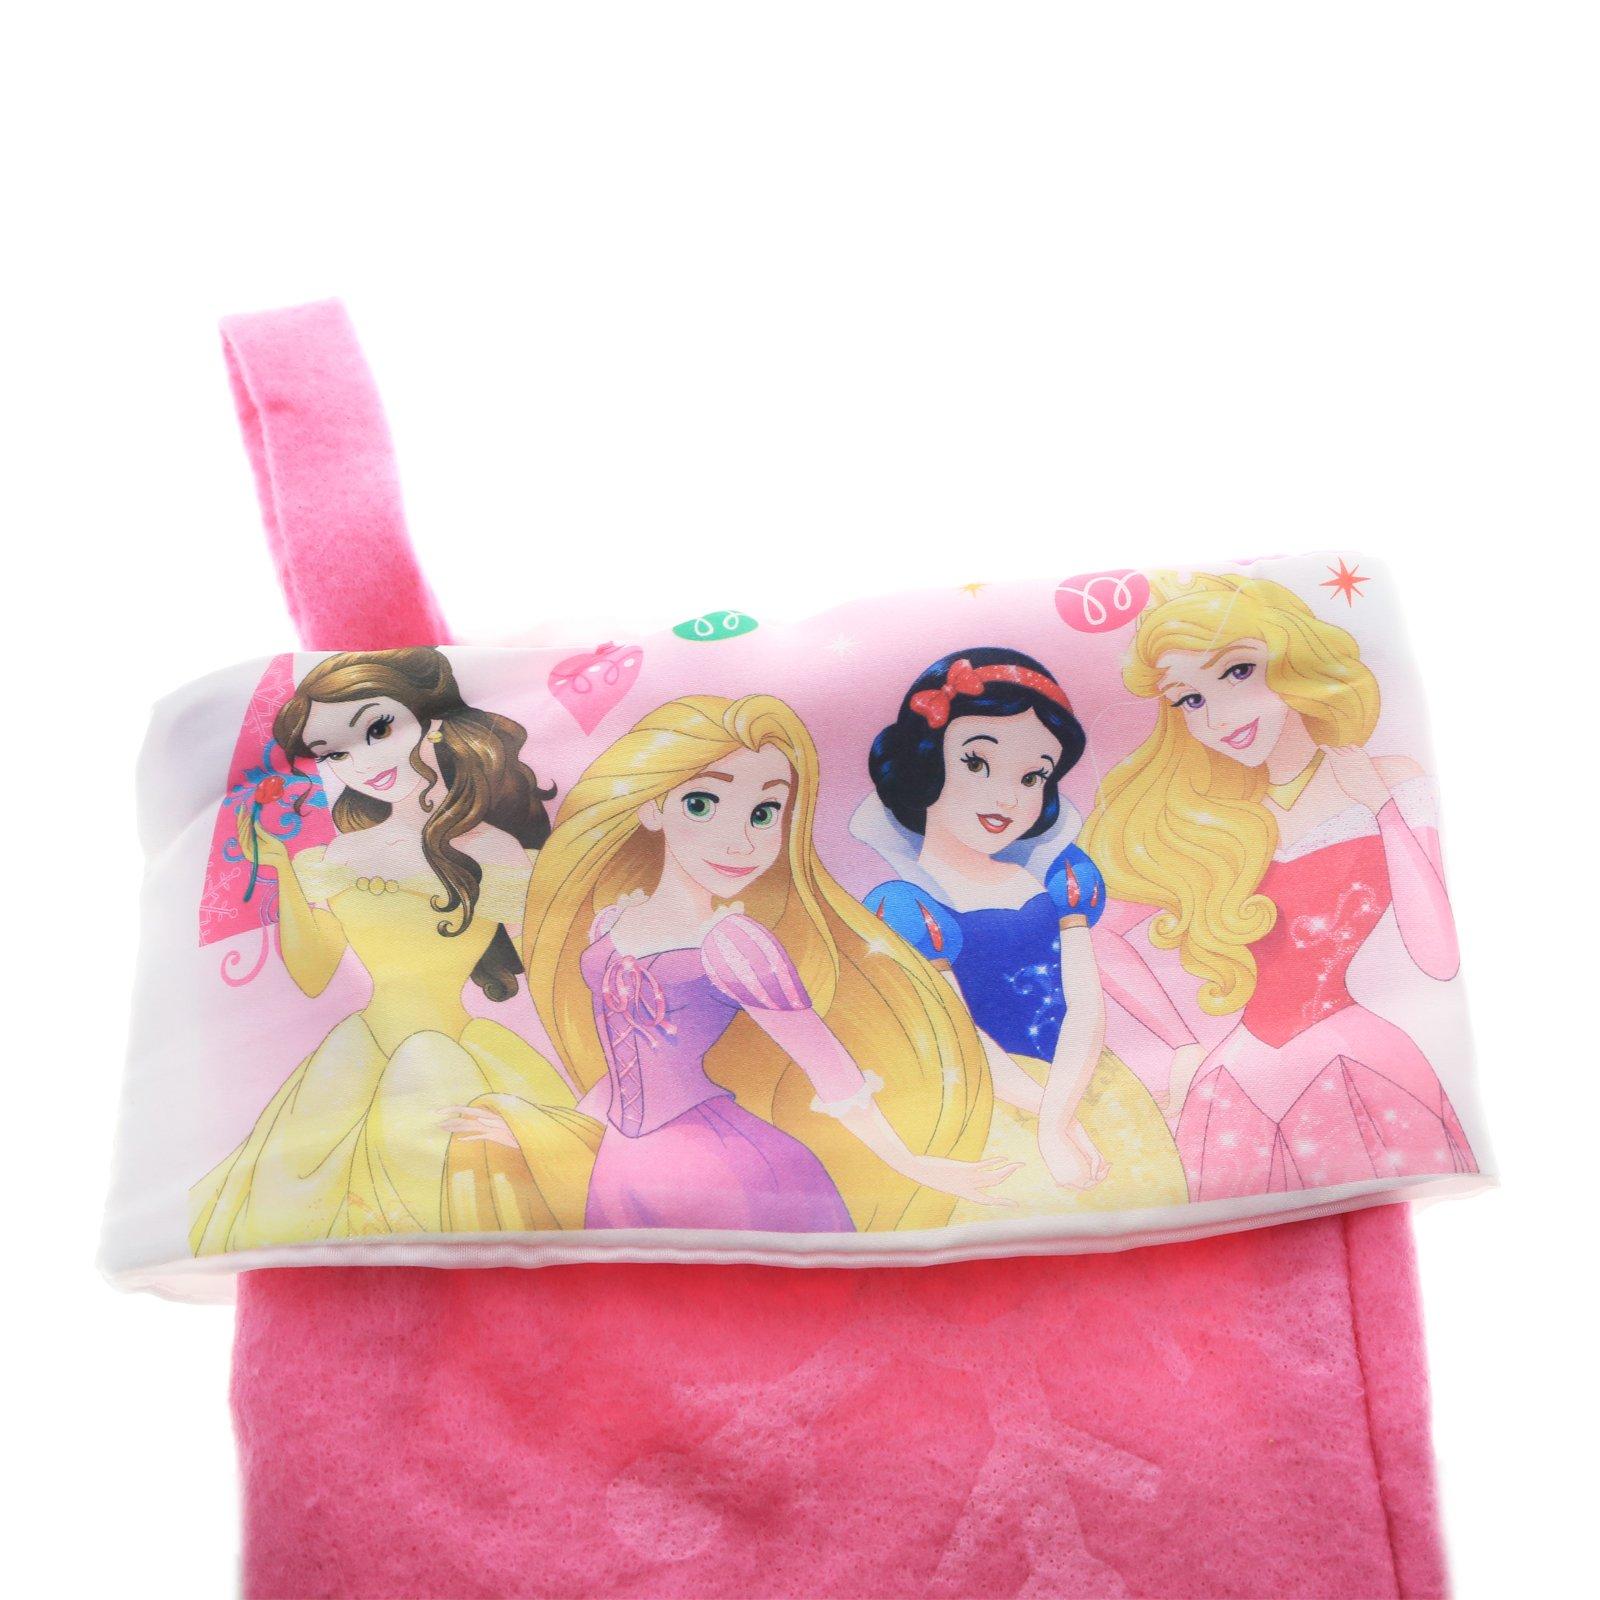 Disney Princess Girls 18in Christmas Stocking with Printed Satin Cuff - Pink